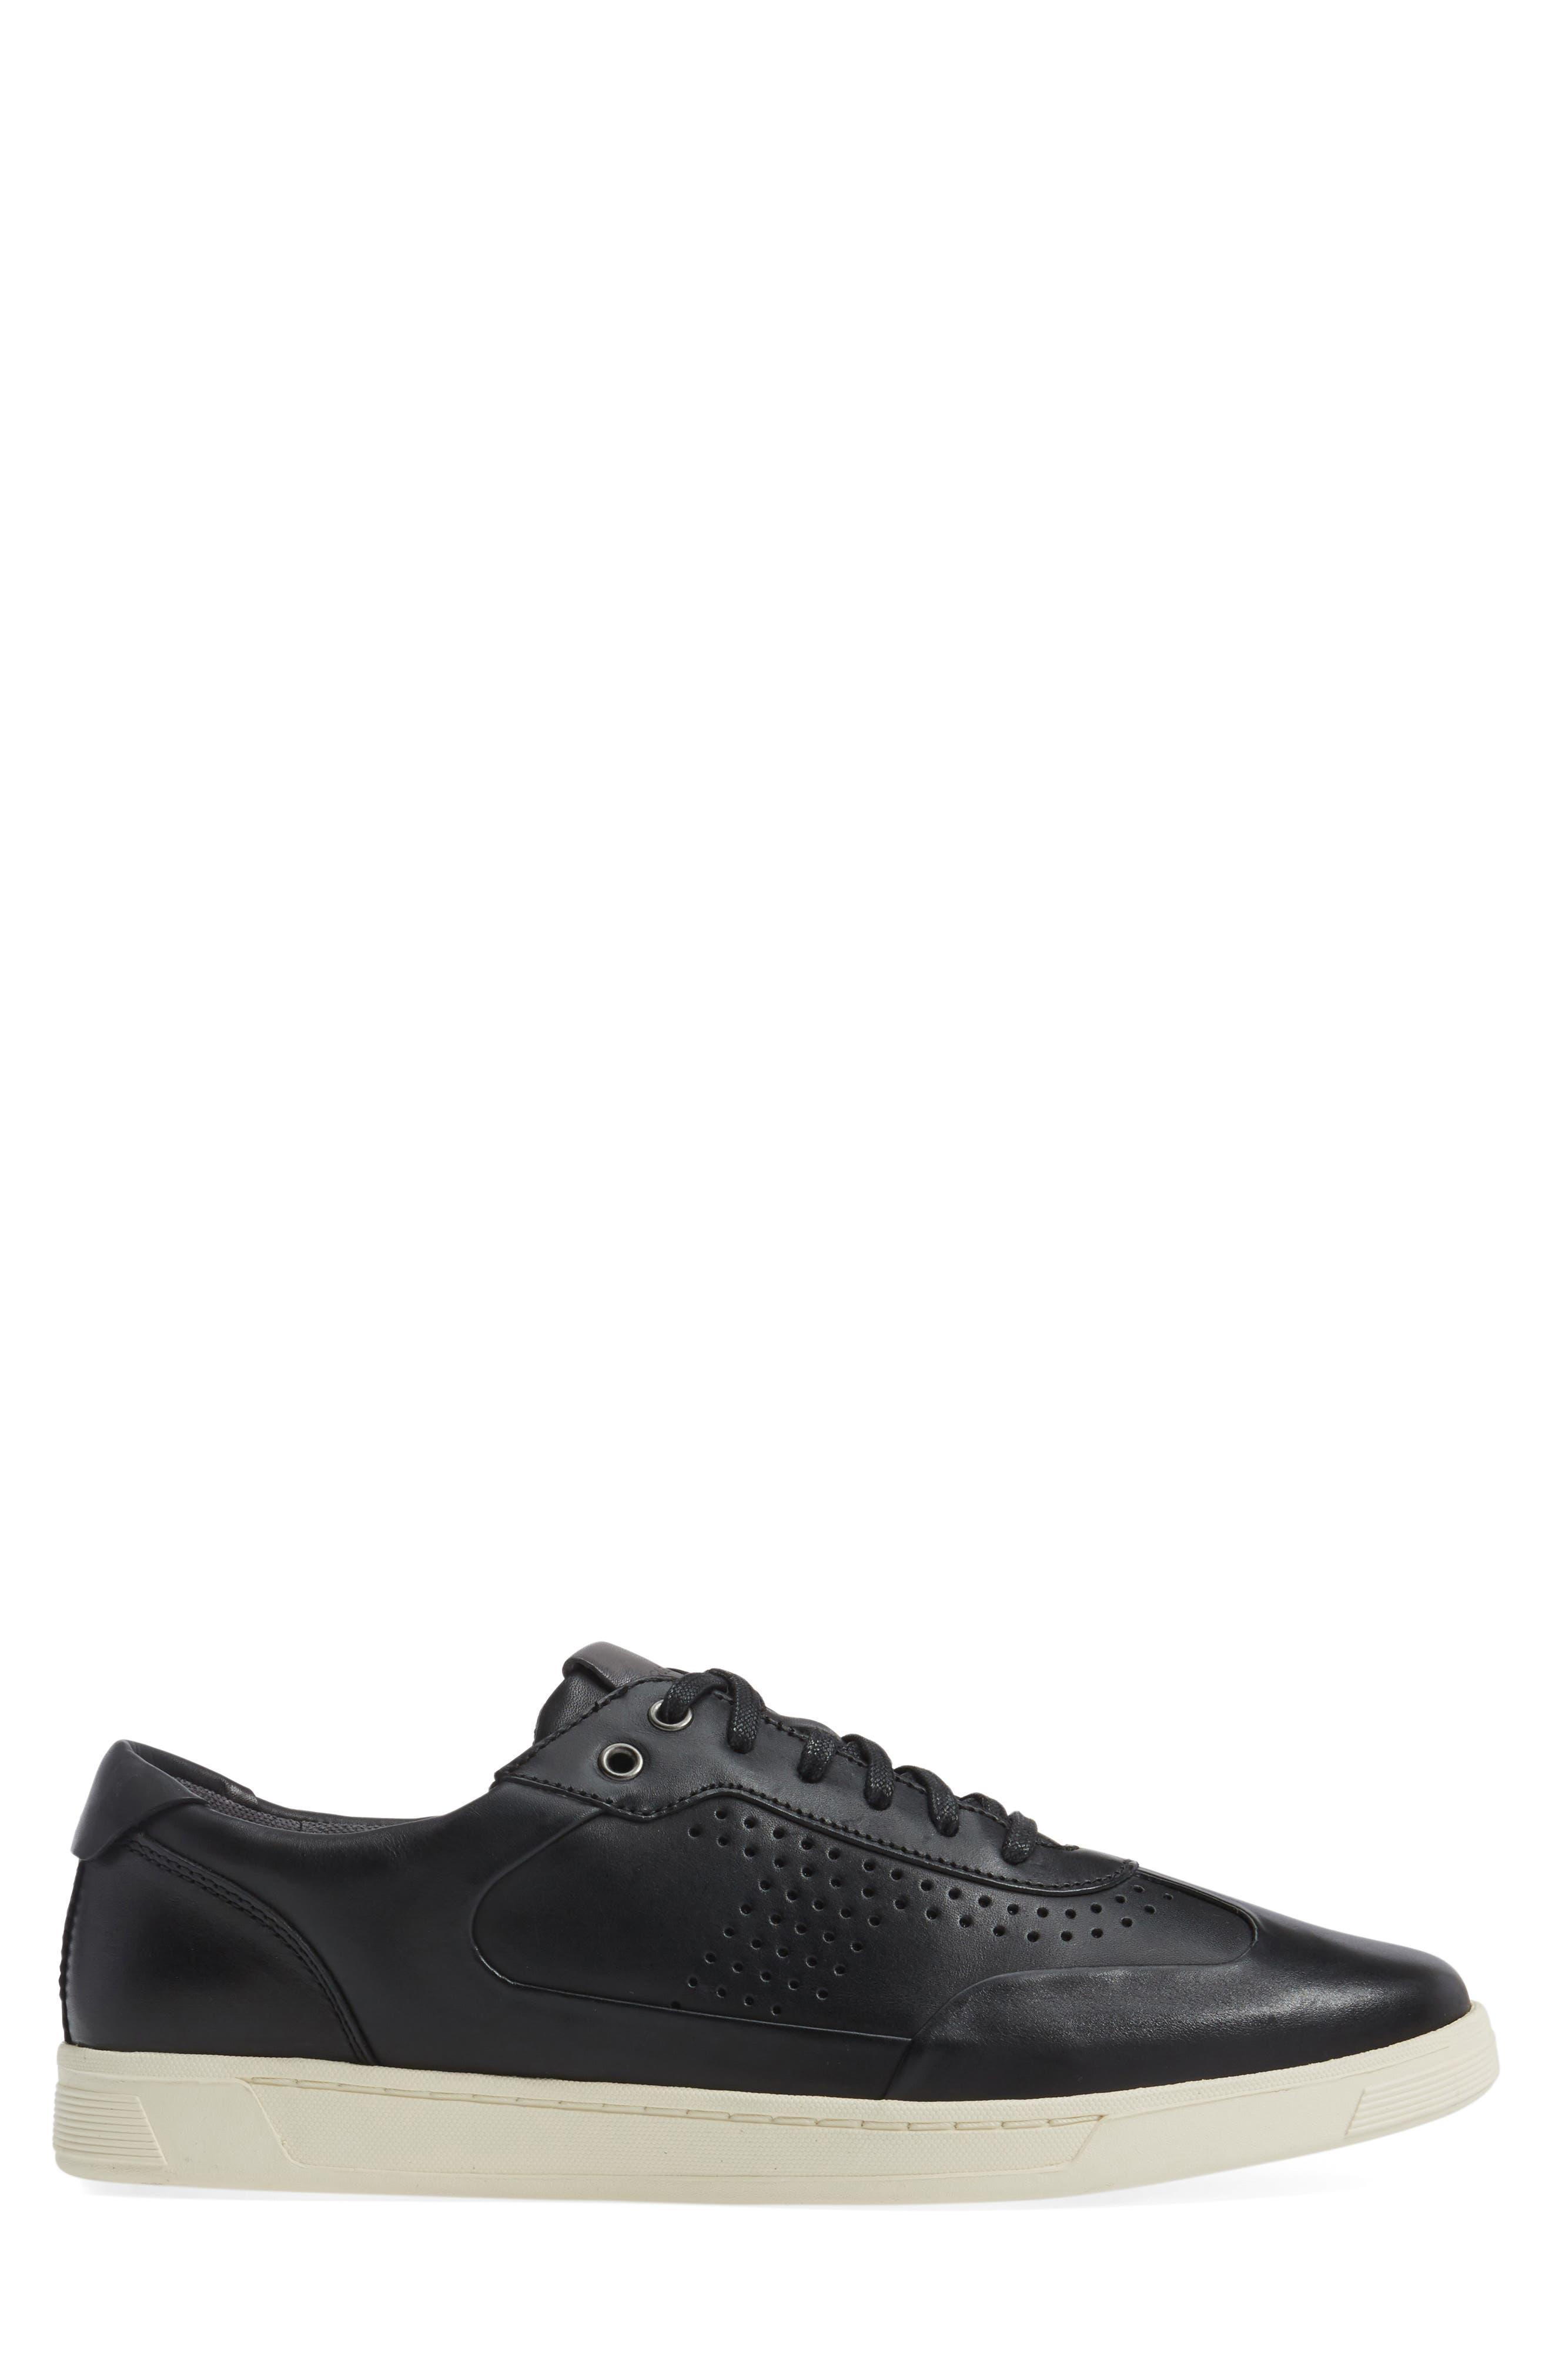 'Vartan Sport Oxford' Sneaker,                             Alternate thumbnail 34, color,